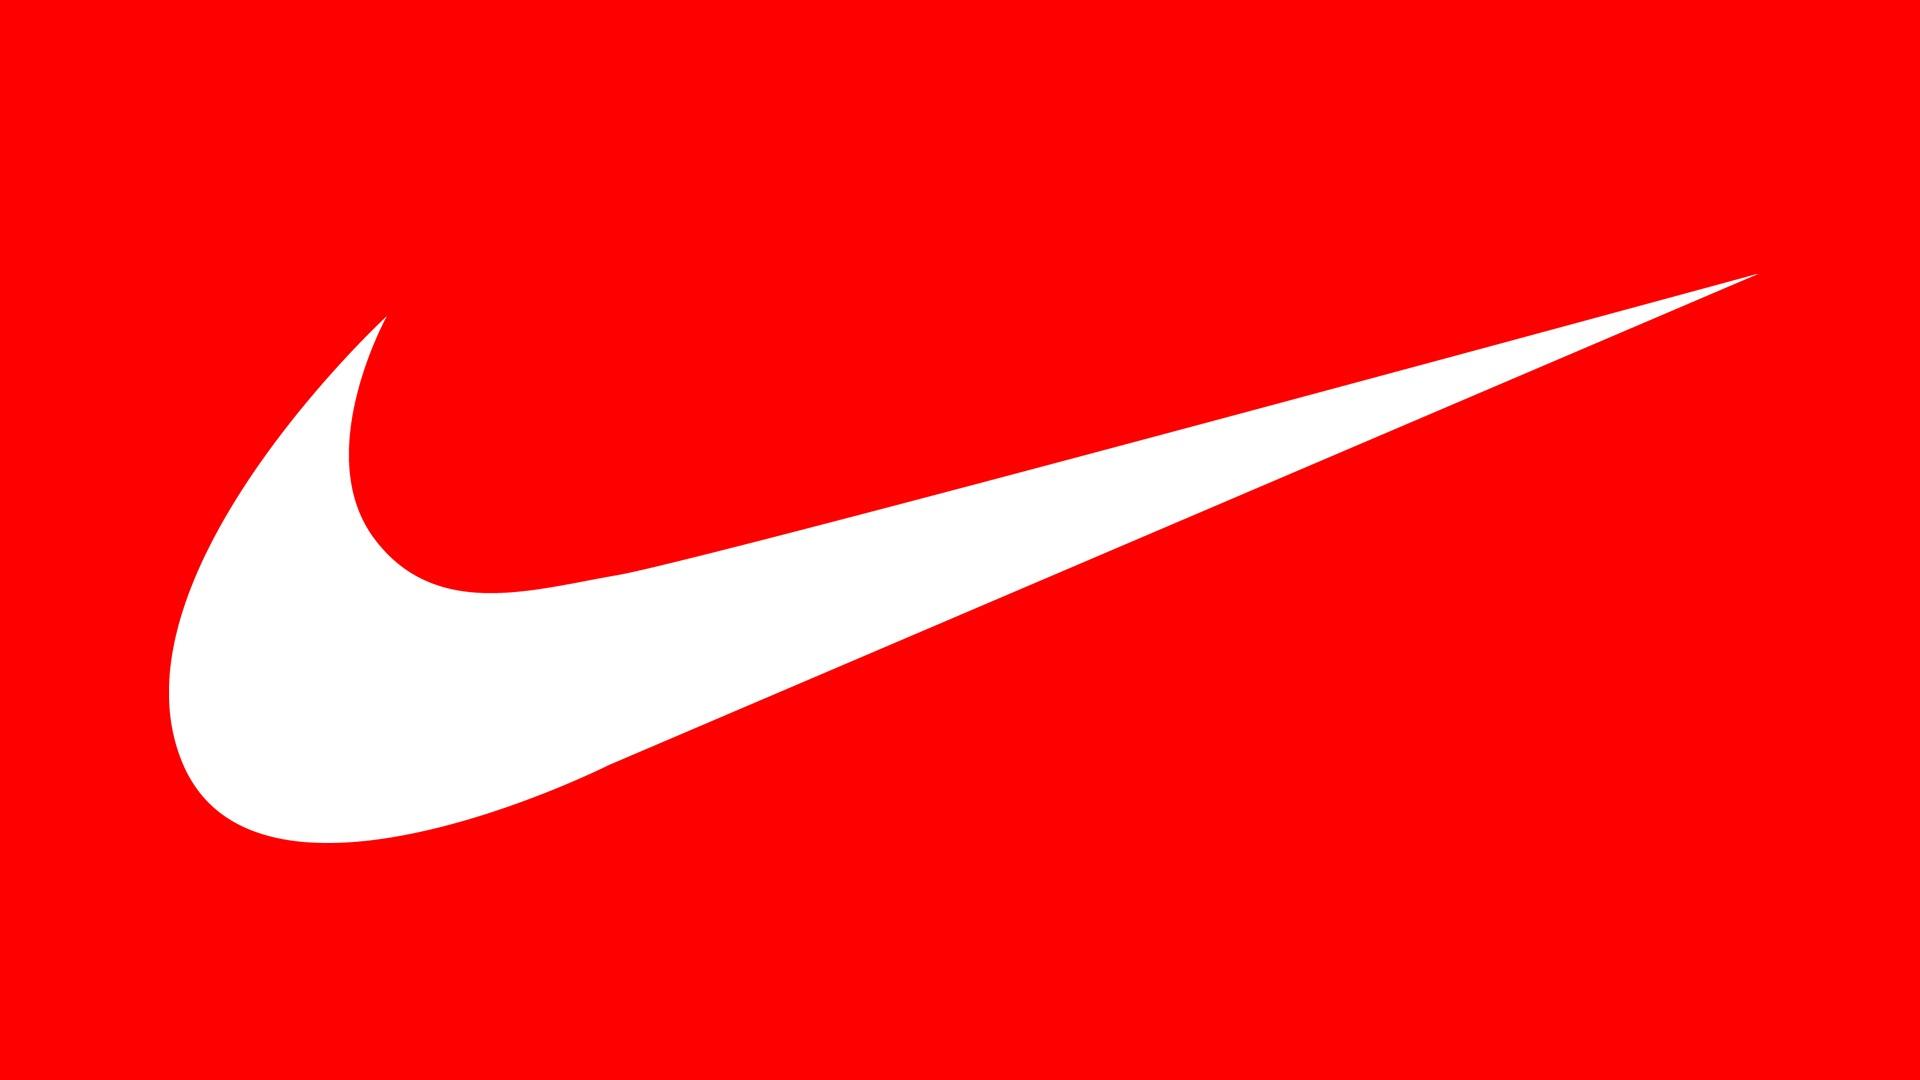 Nike Quotes Wallpaper QuotesGram 1920x1080